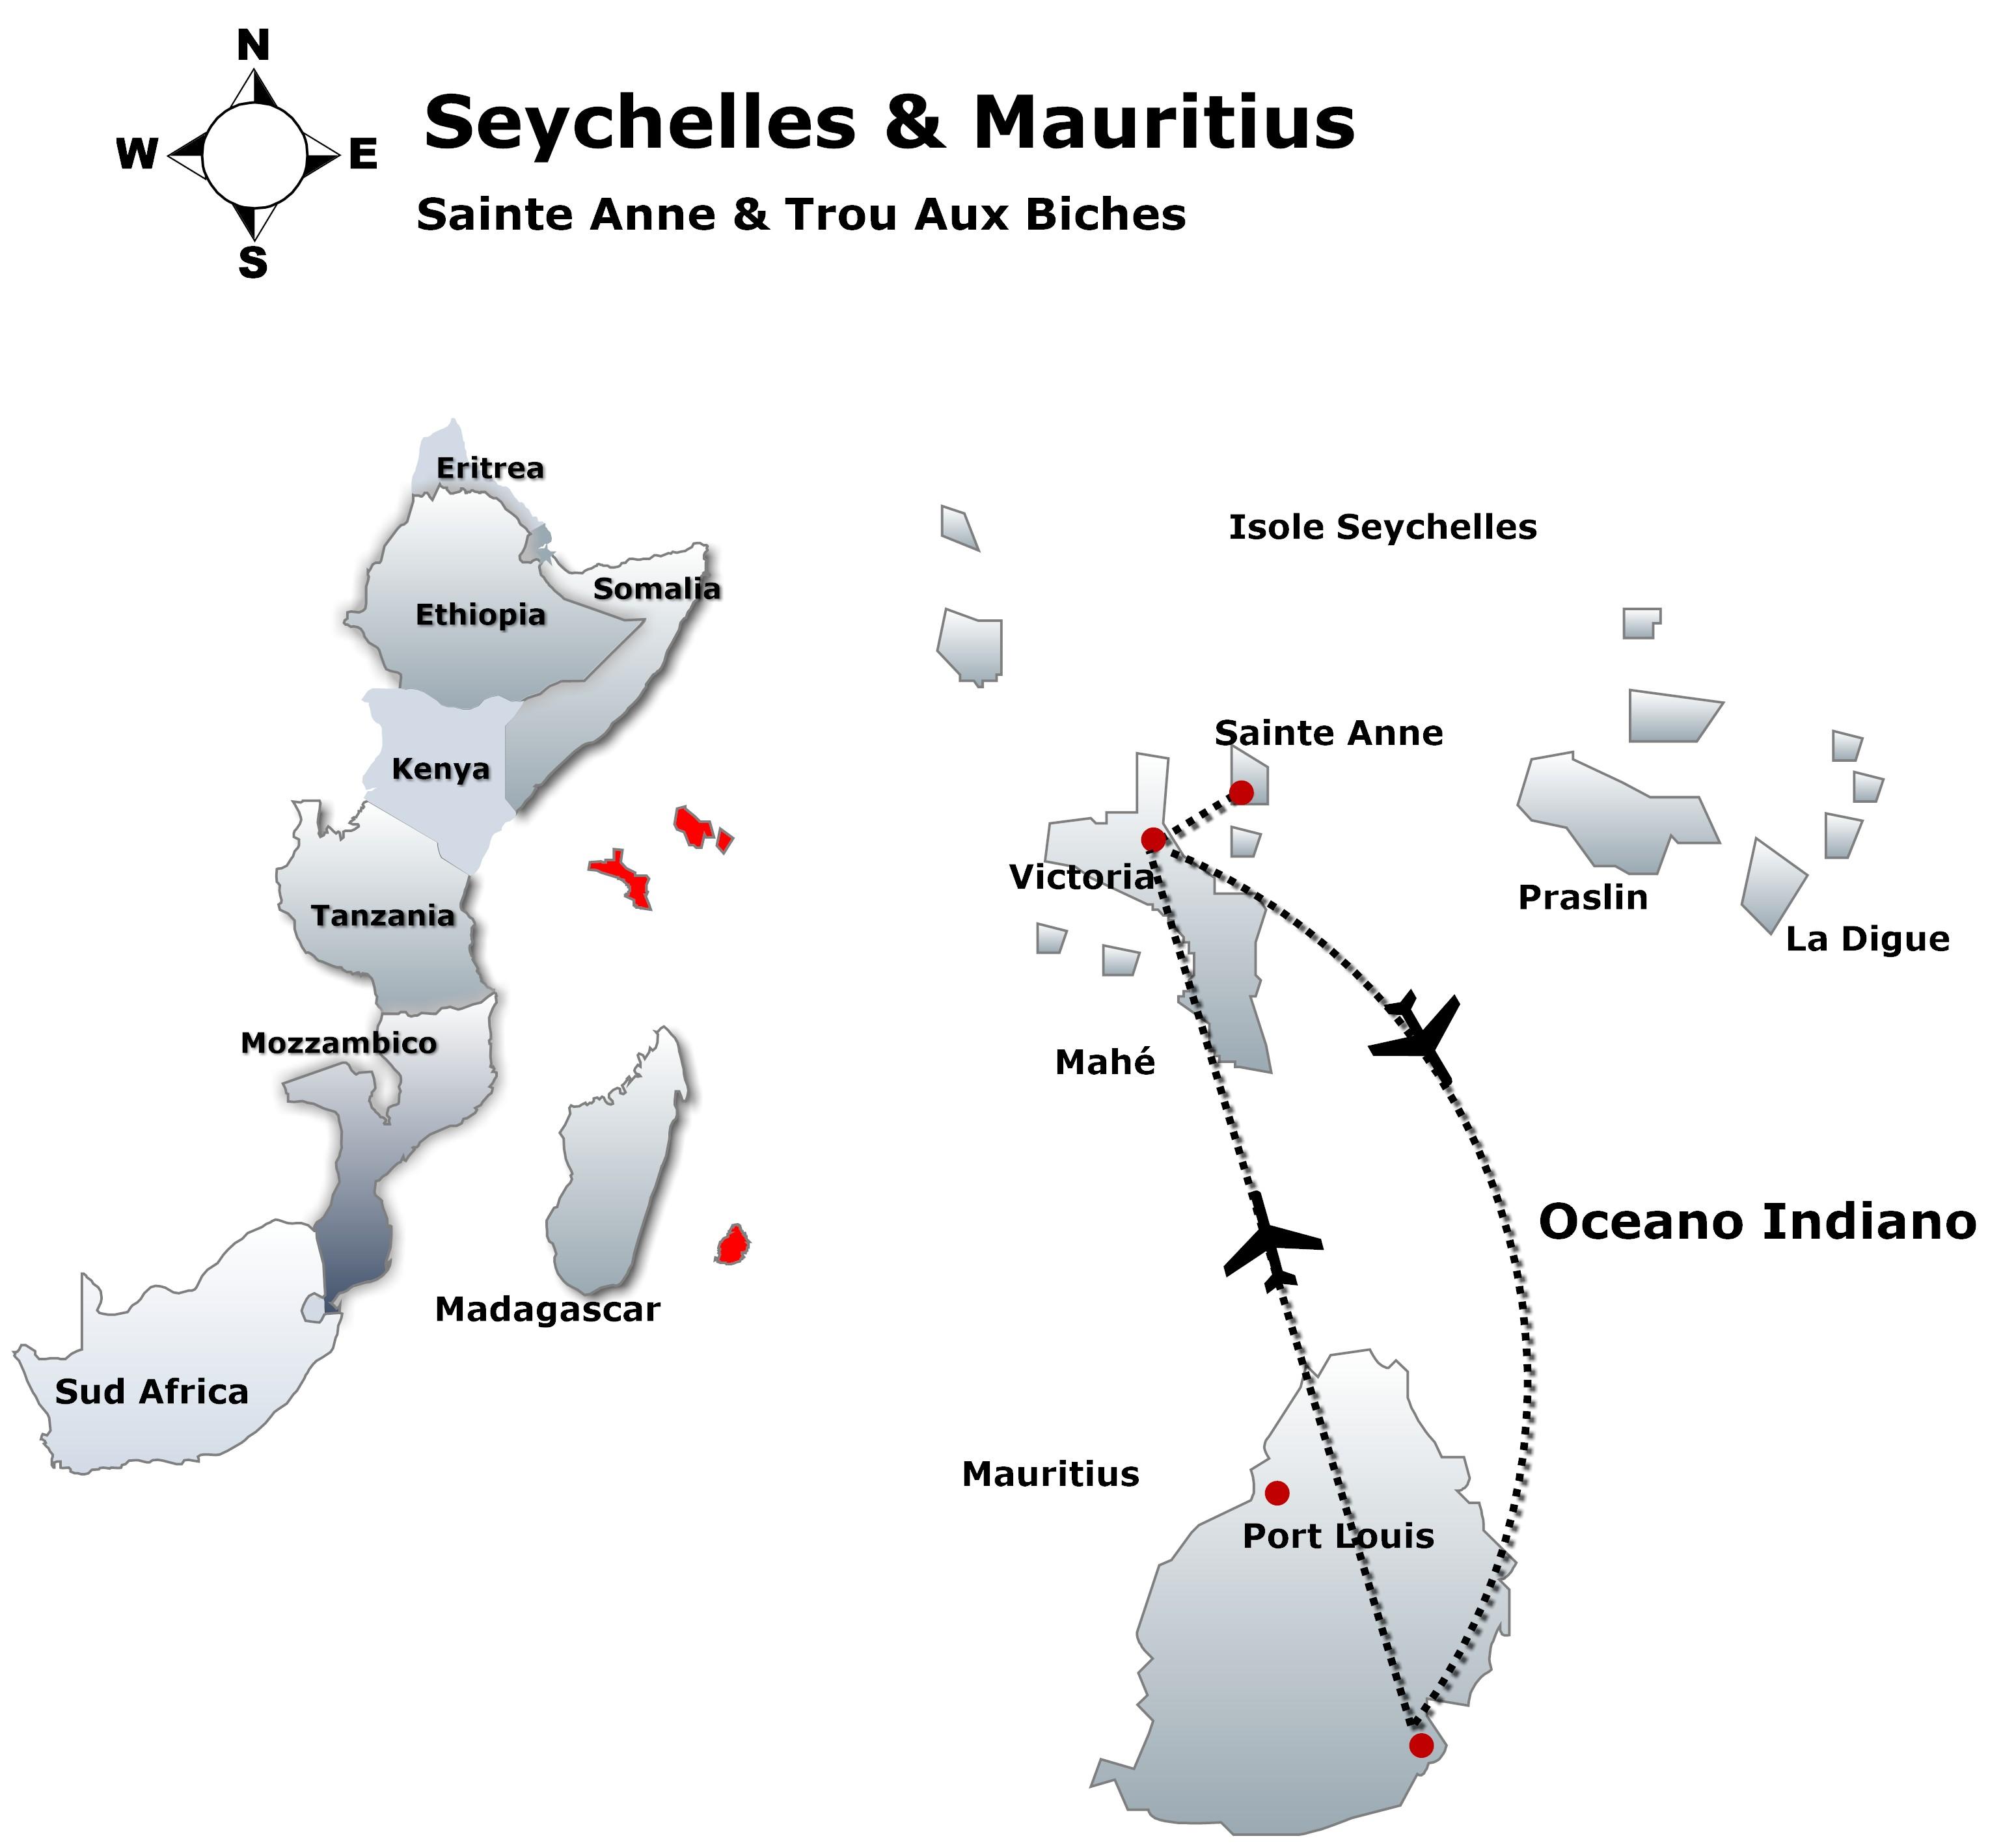 seychelles & mauritius